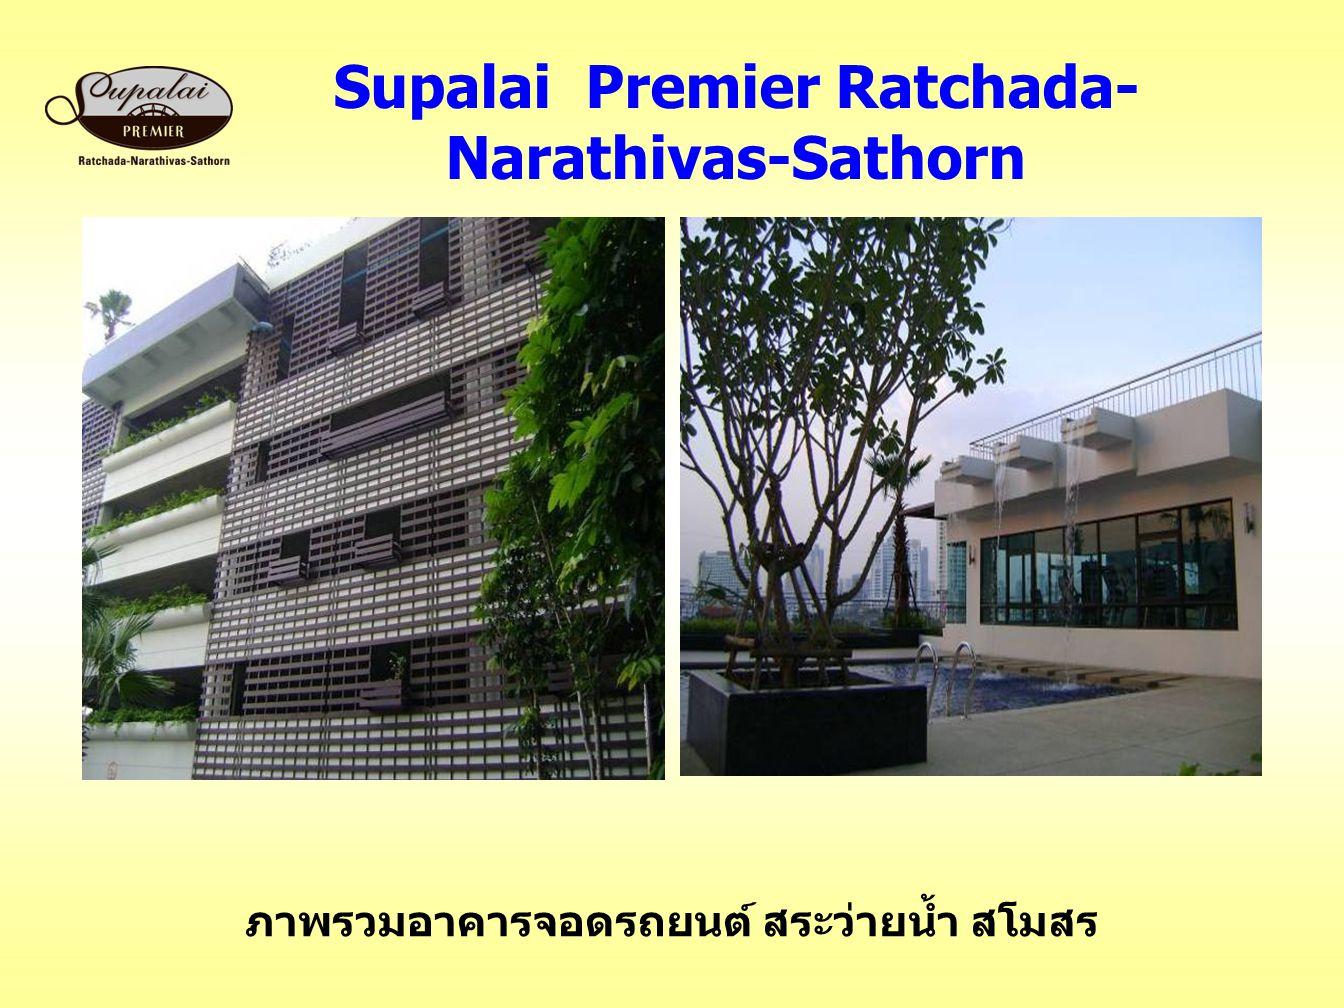 Supalai Premier Ratchada- Narathivas-Sathorn ภาพรวมอาคารจอดรถยนต์ สระว่ายน้ำ สโมสร